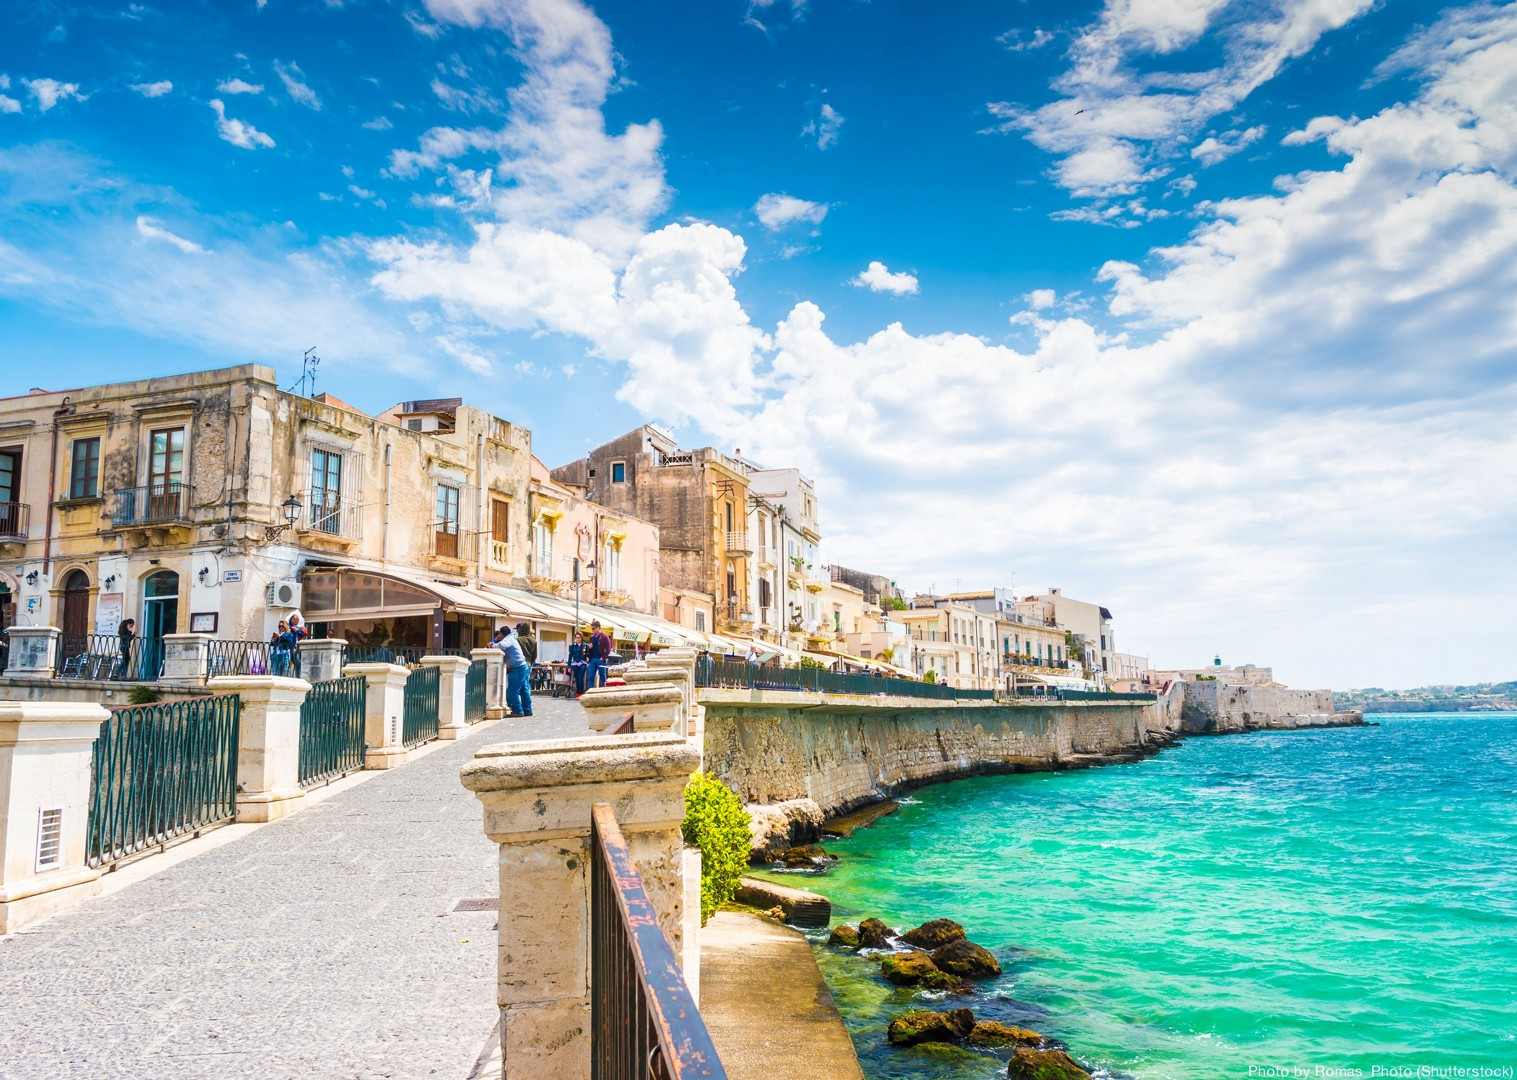 coastal-road-to-capo-passero-italy-sicily-cycling-tour.jpg - Italy - Sicily - Self-Guided Leisure Cycling Holiday - Italia Leisure and Family Cycling